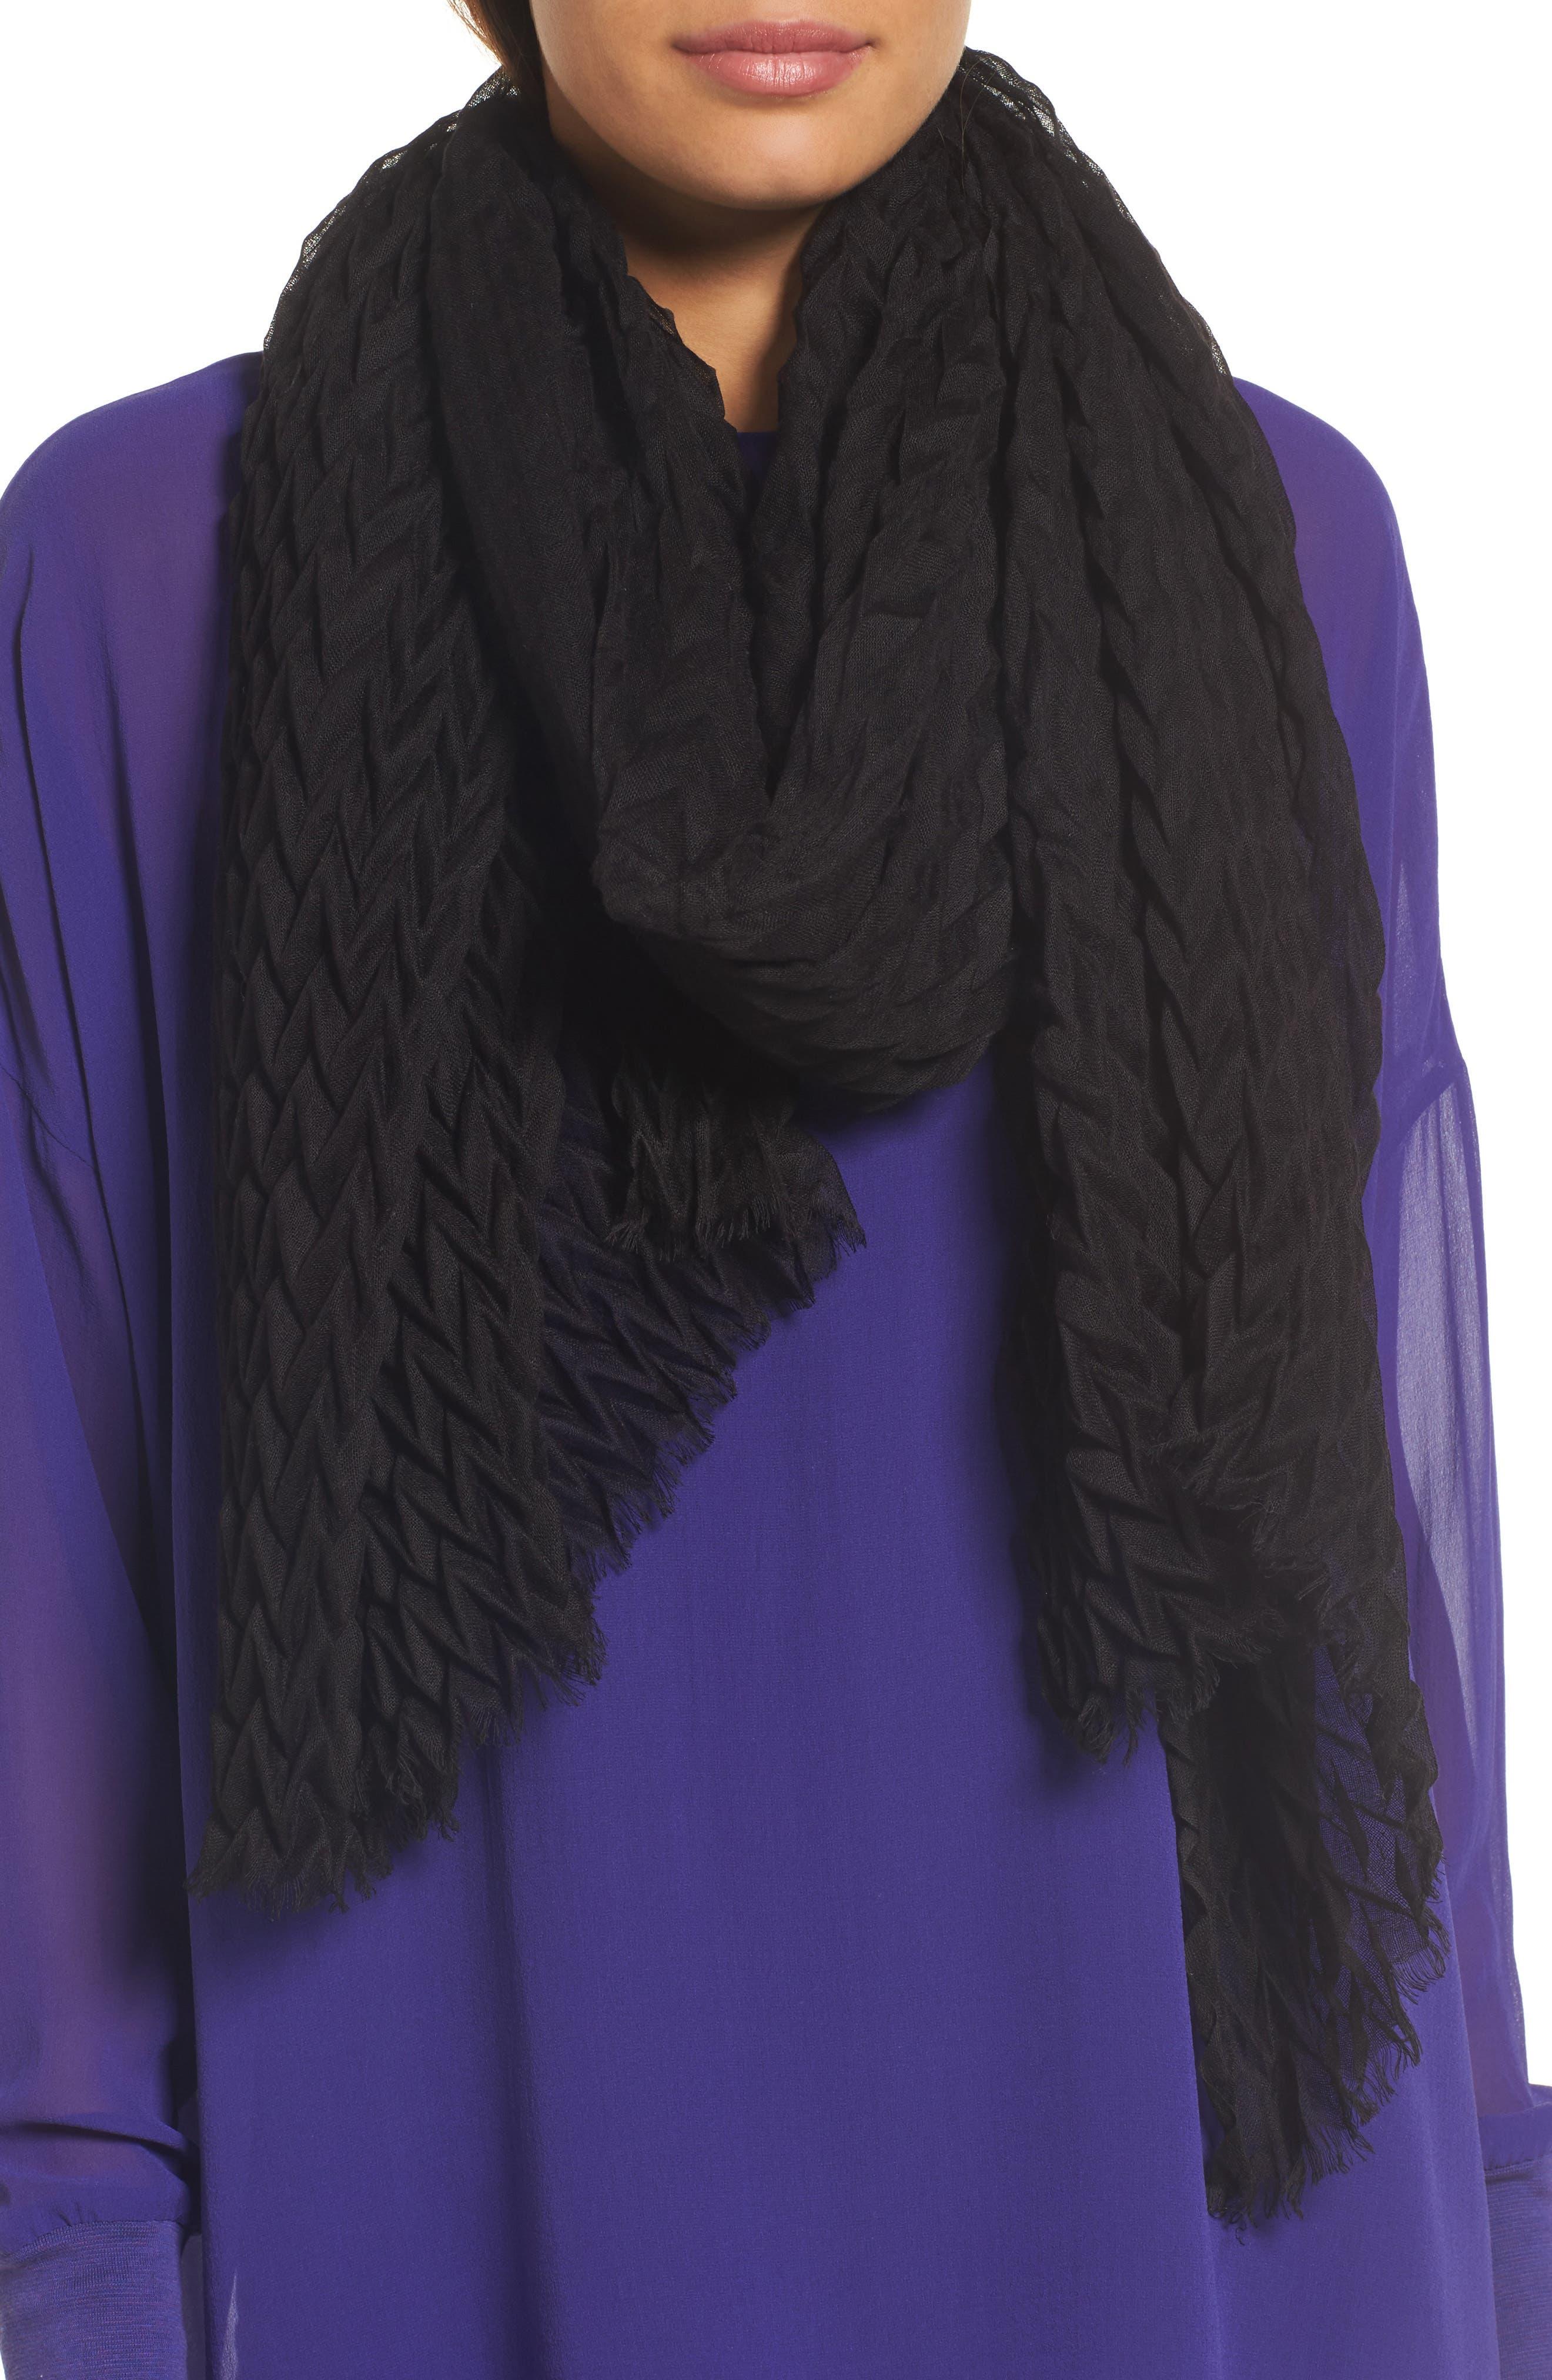 Silk & Wool Wrap,                         Main,                         color, 001